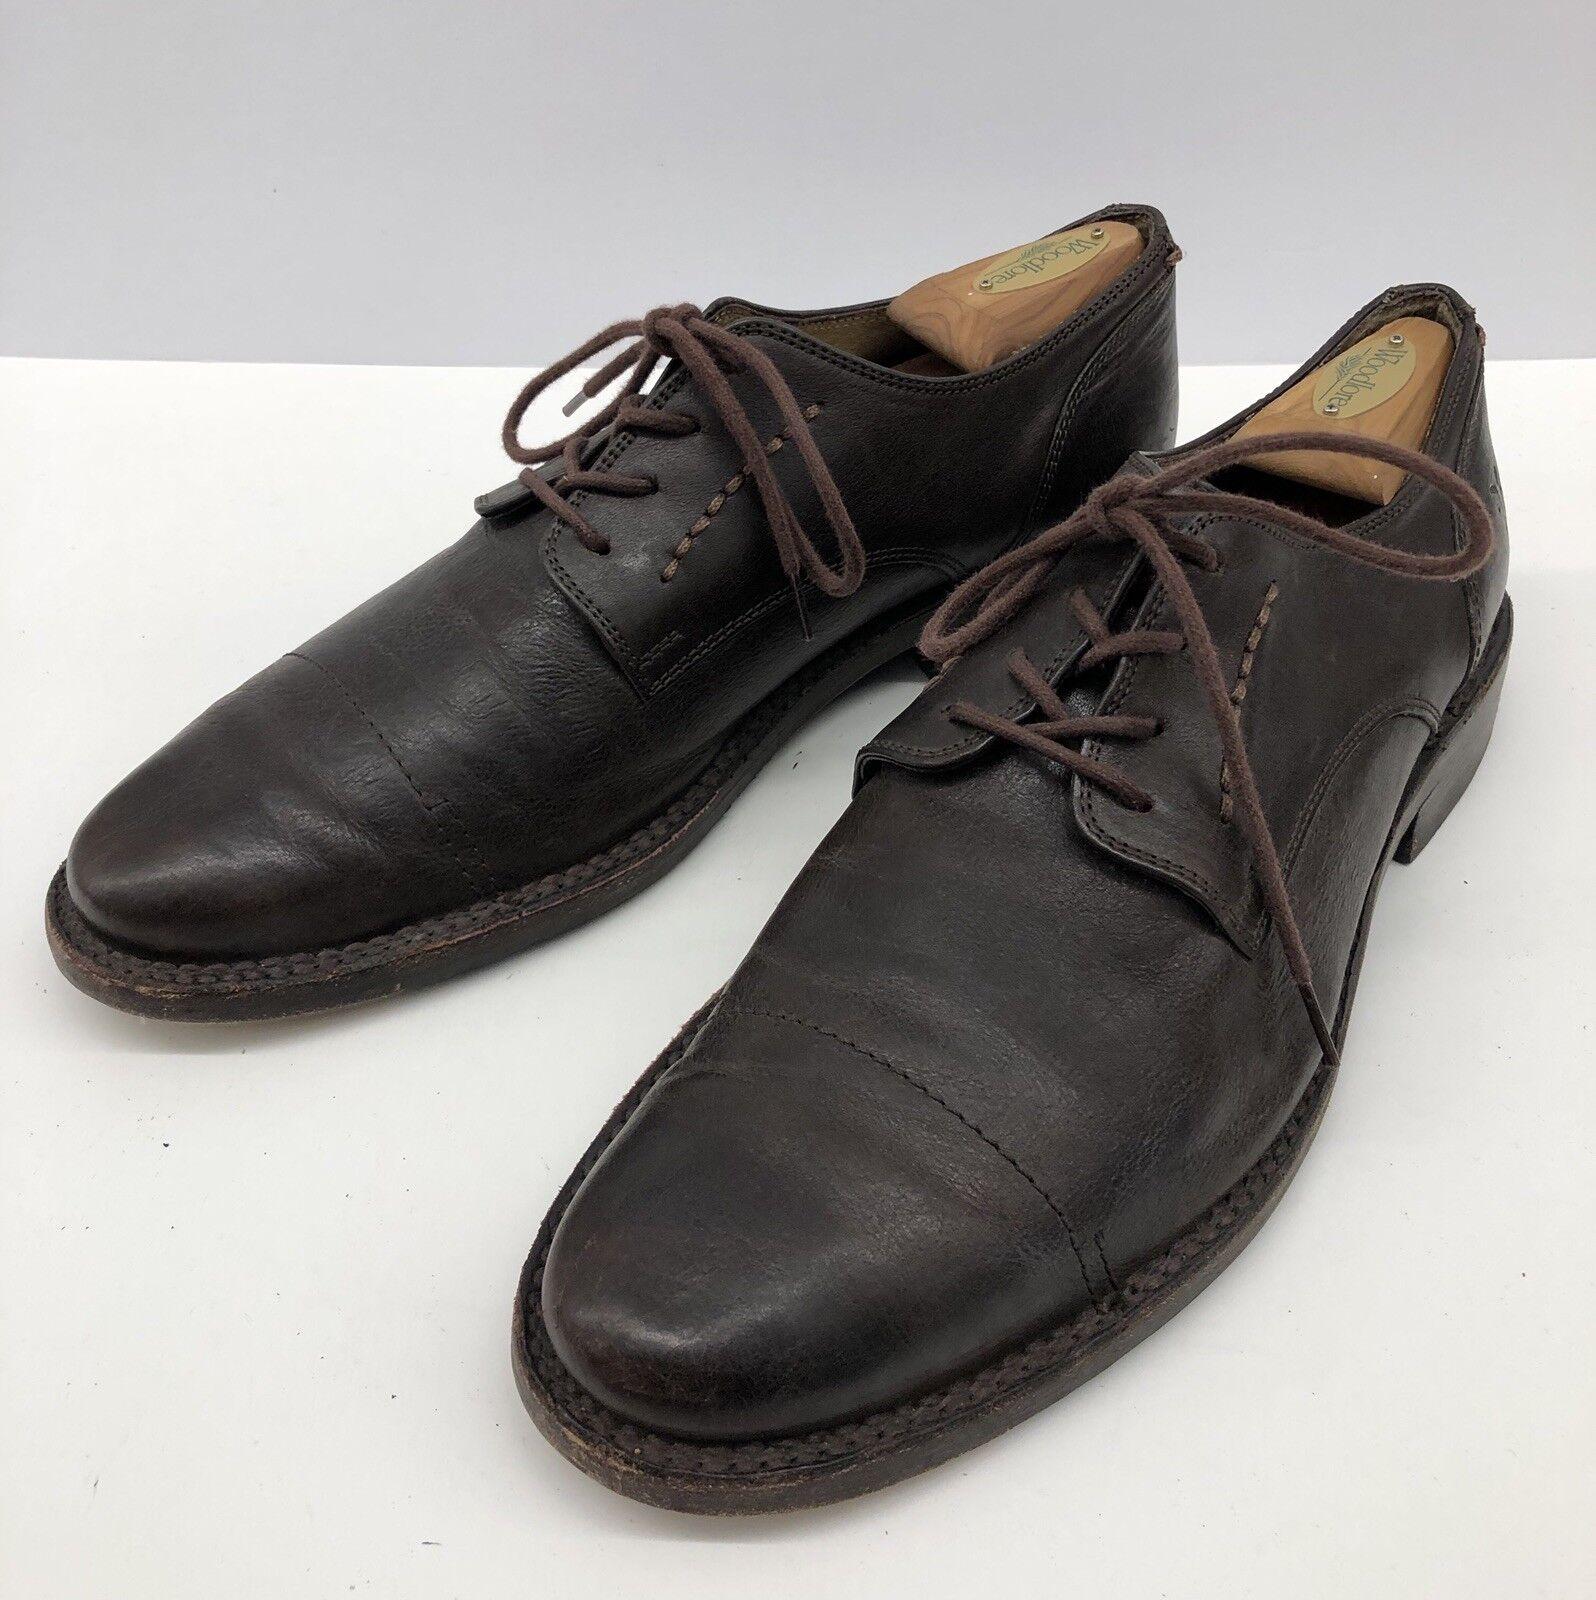 John A. FRYE braun Leather Cap Toe Comfort Dress Casual Mens schuhe Sz 11 D